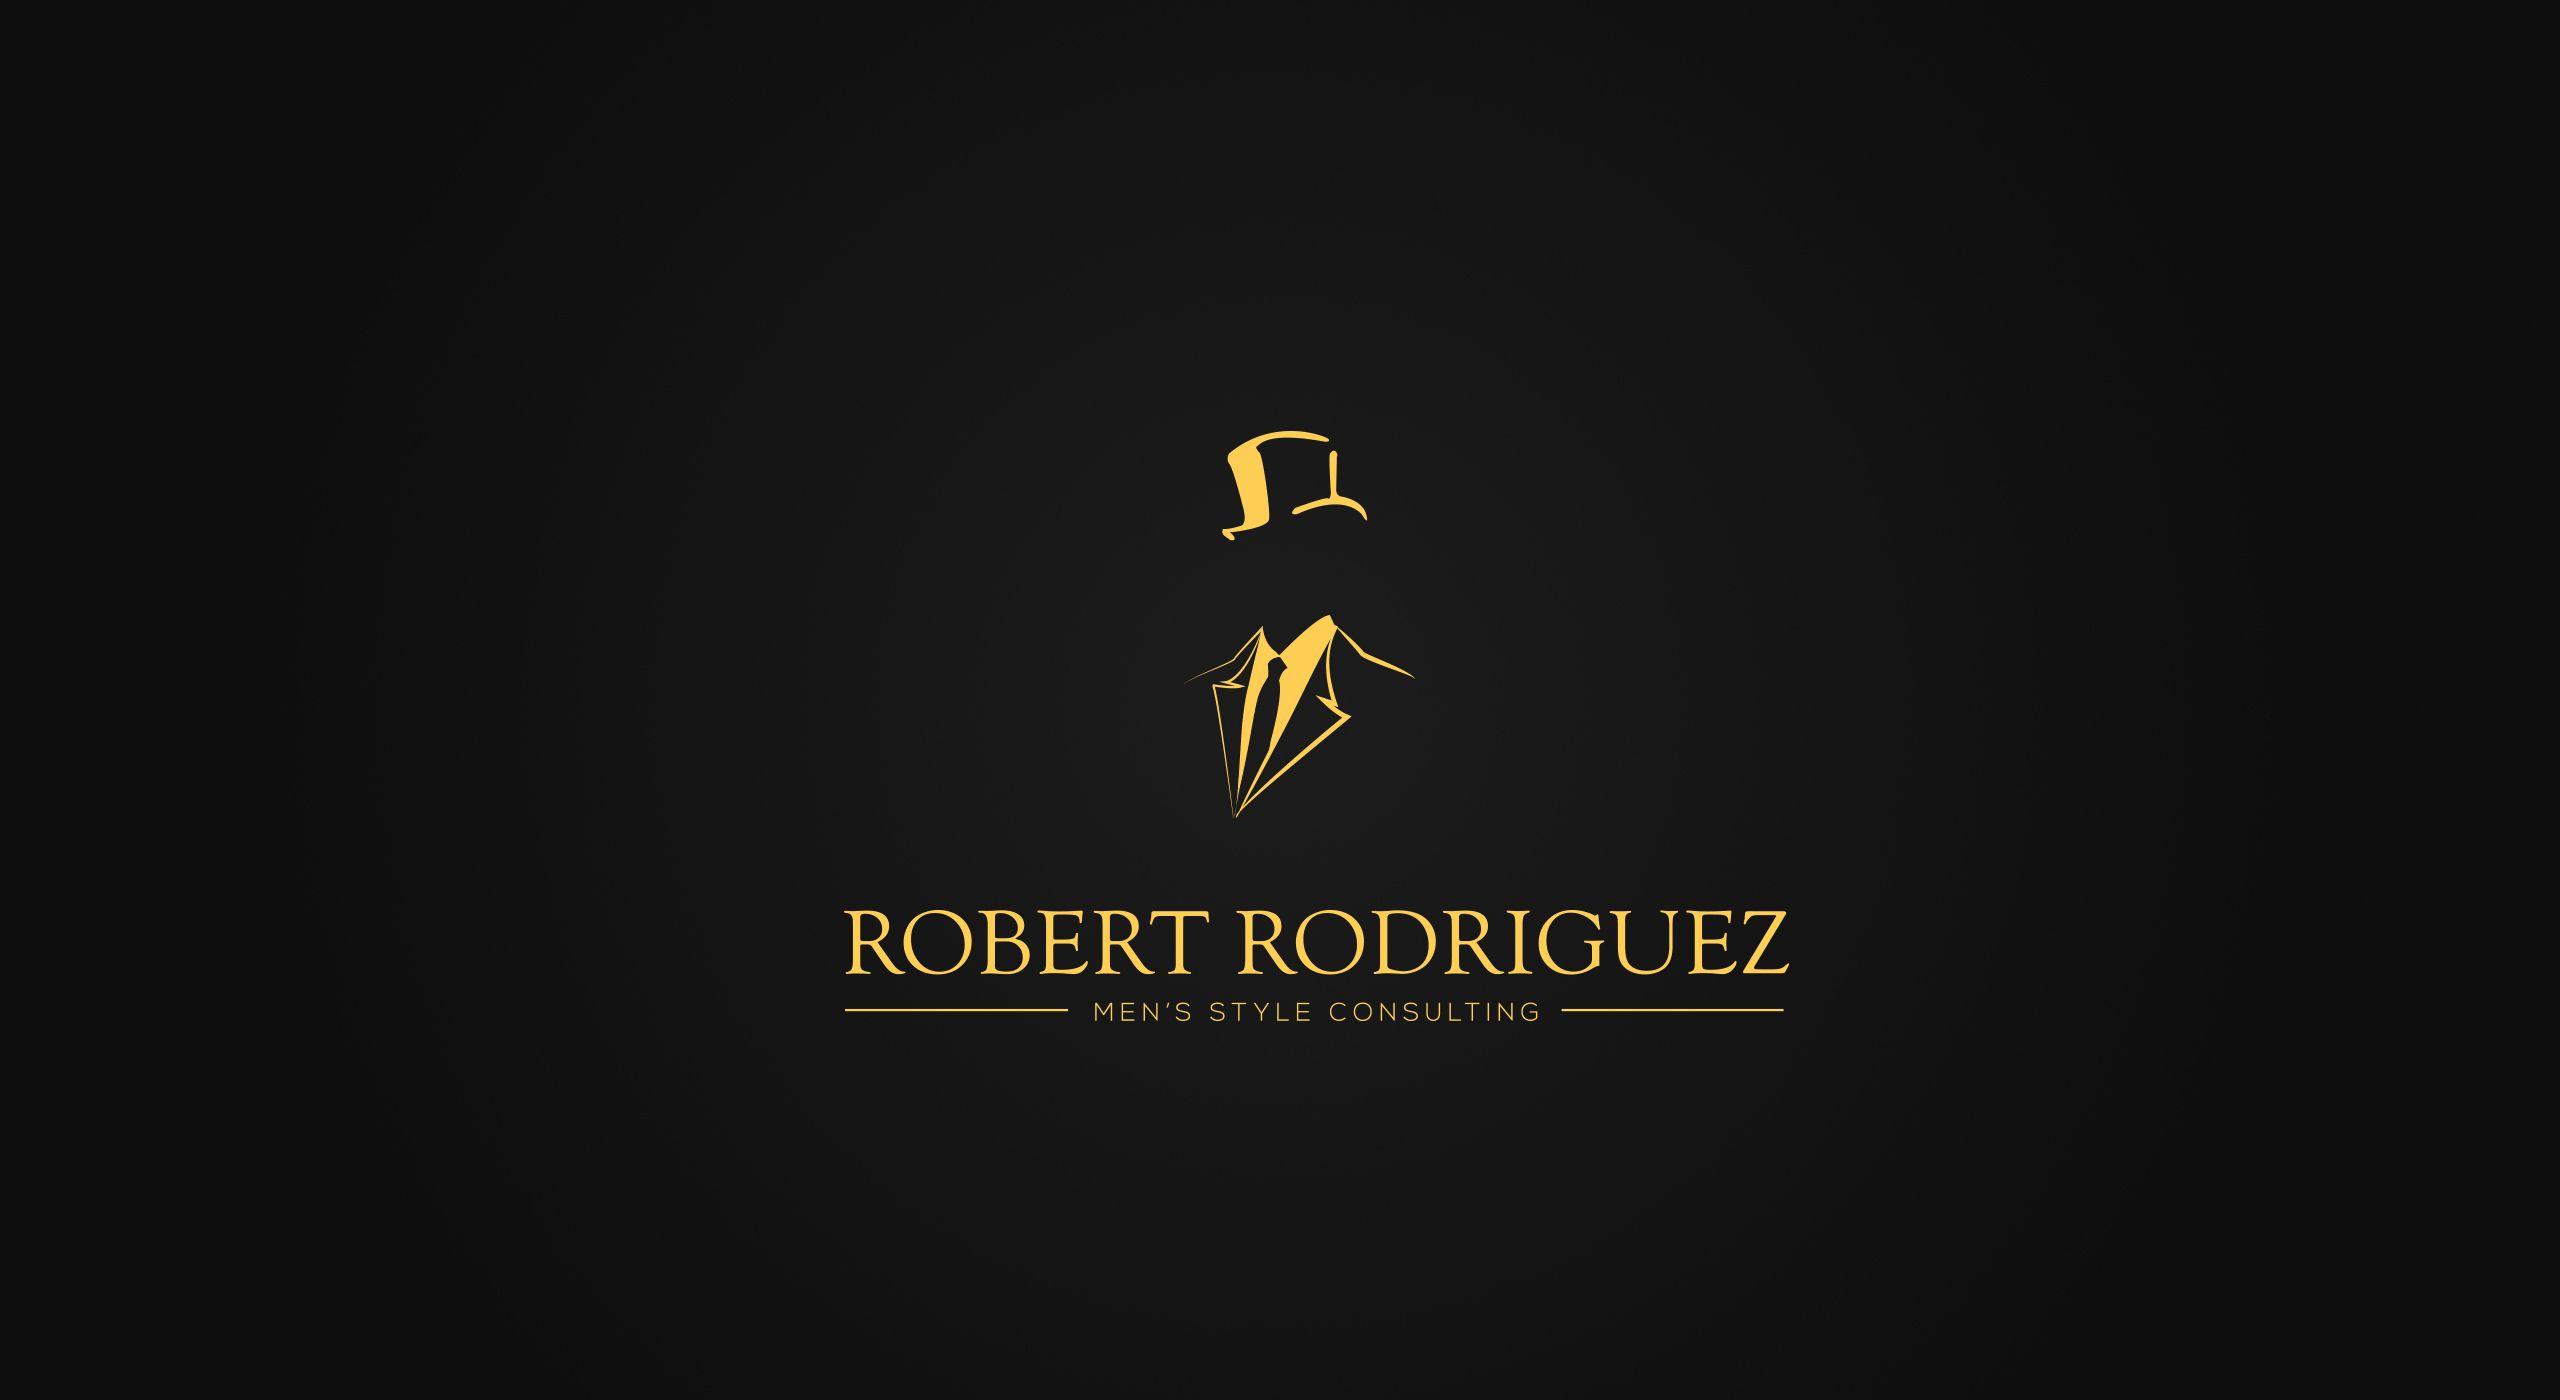 Robert Rodriguez Logo